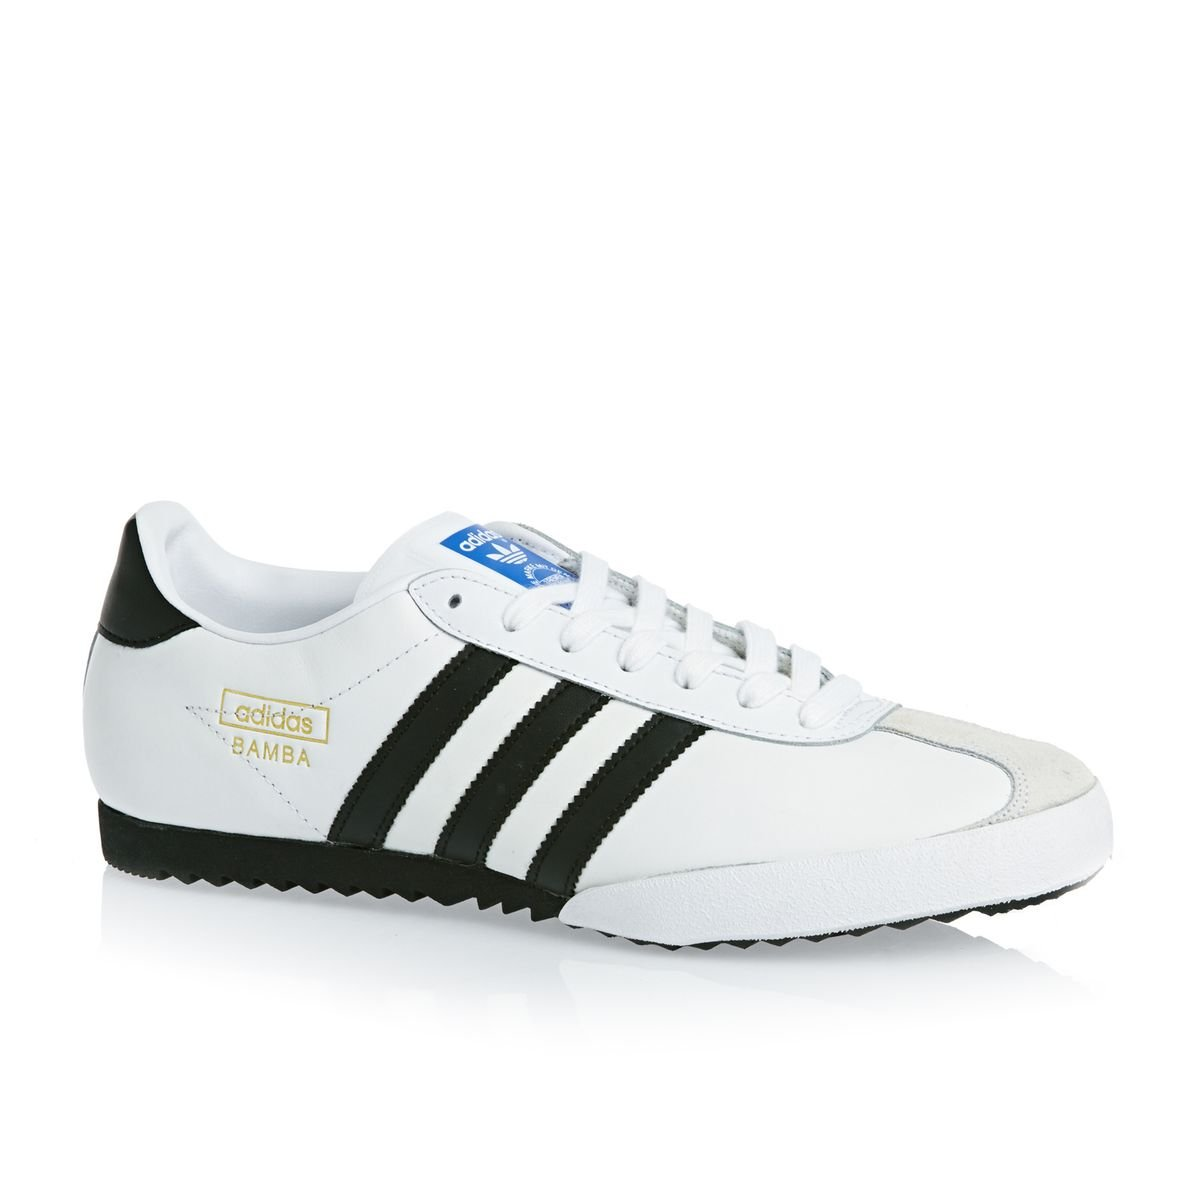 adidas Bamba Coleur: Schwarz Taille: 46.0: : Schuhe